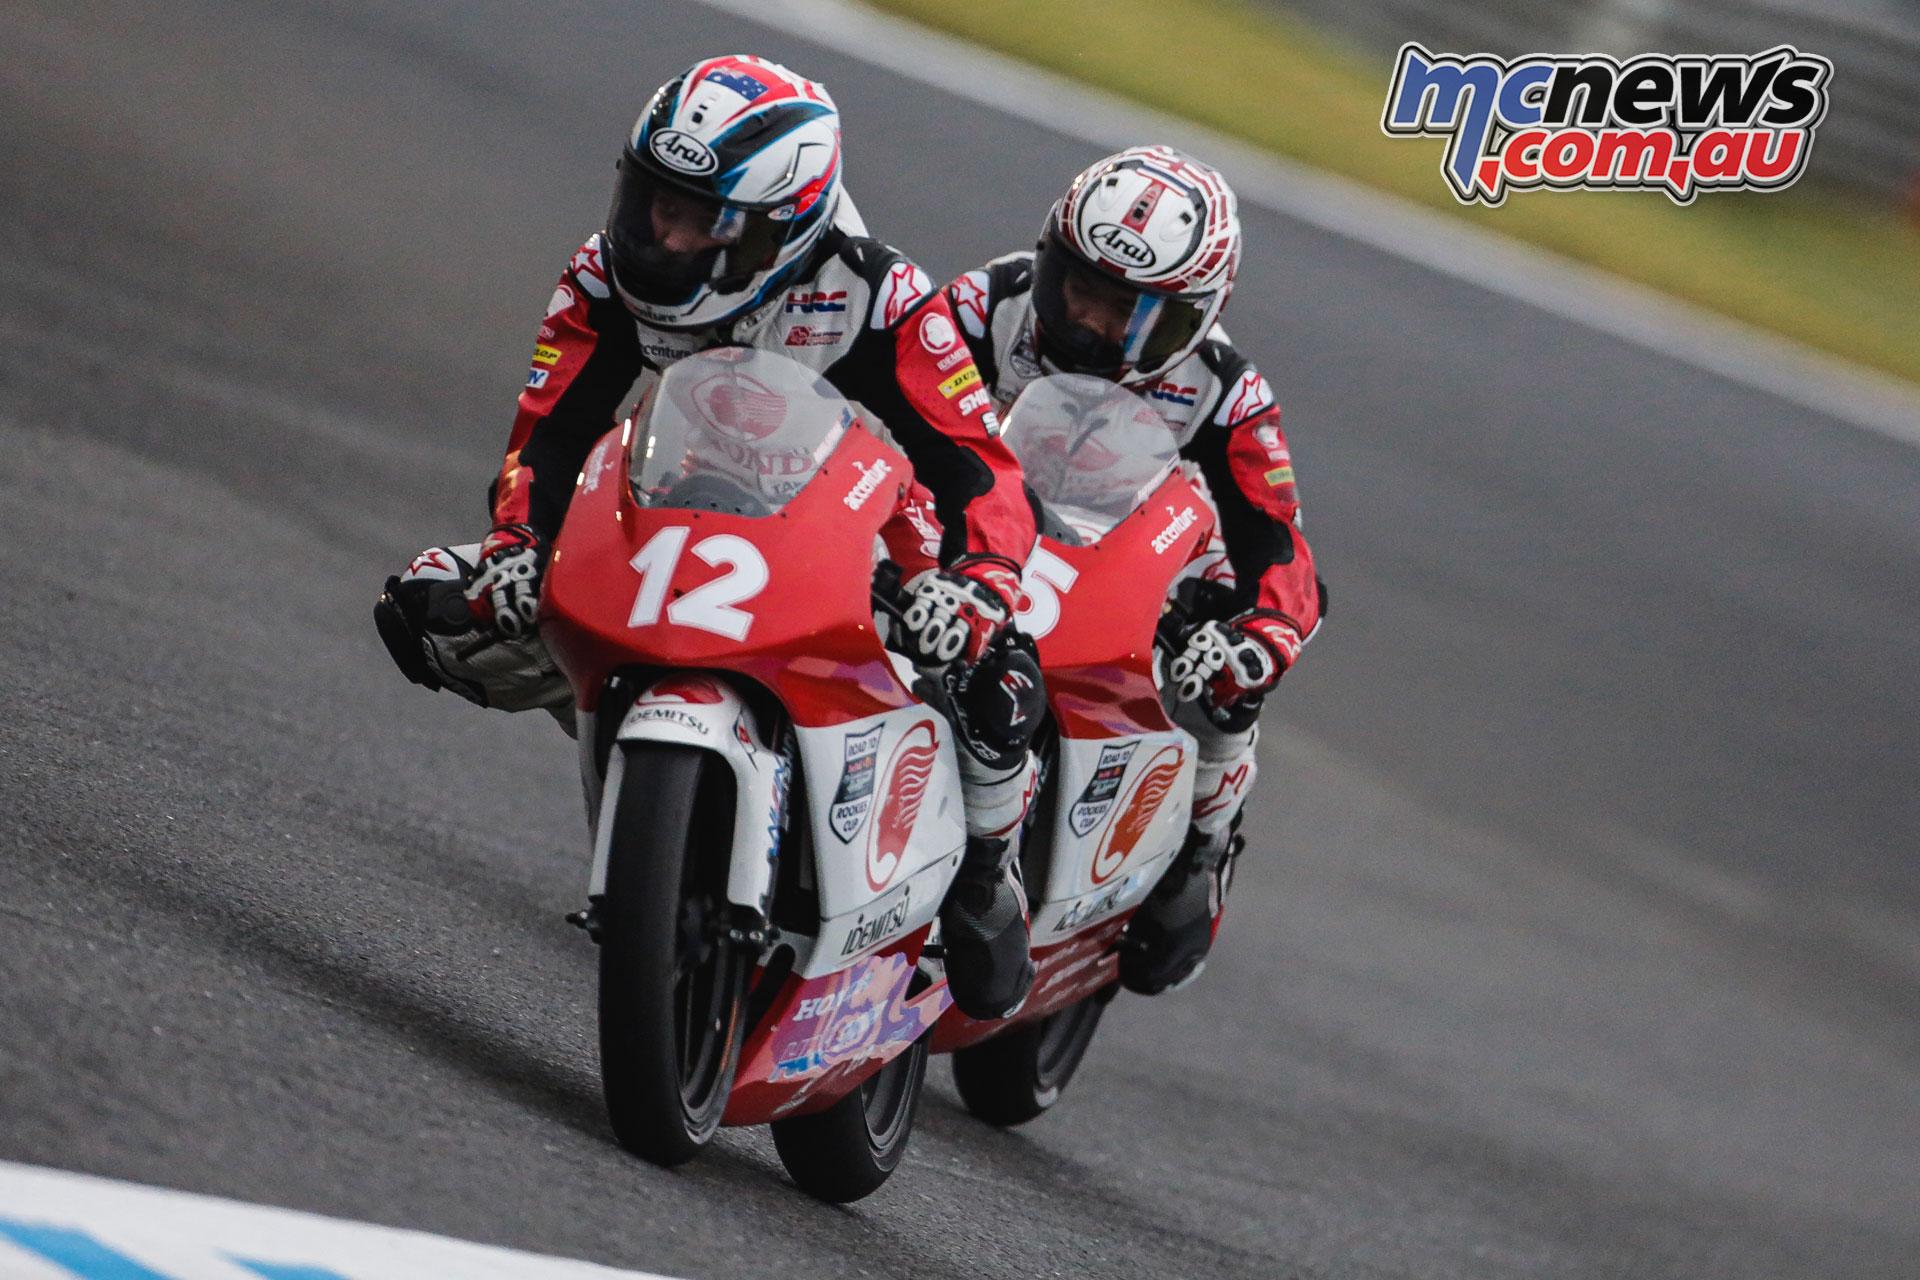 ATC Motegi Rd Race Roulstone ZA